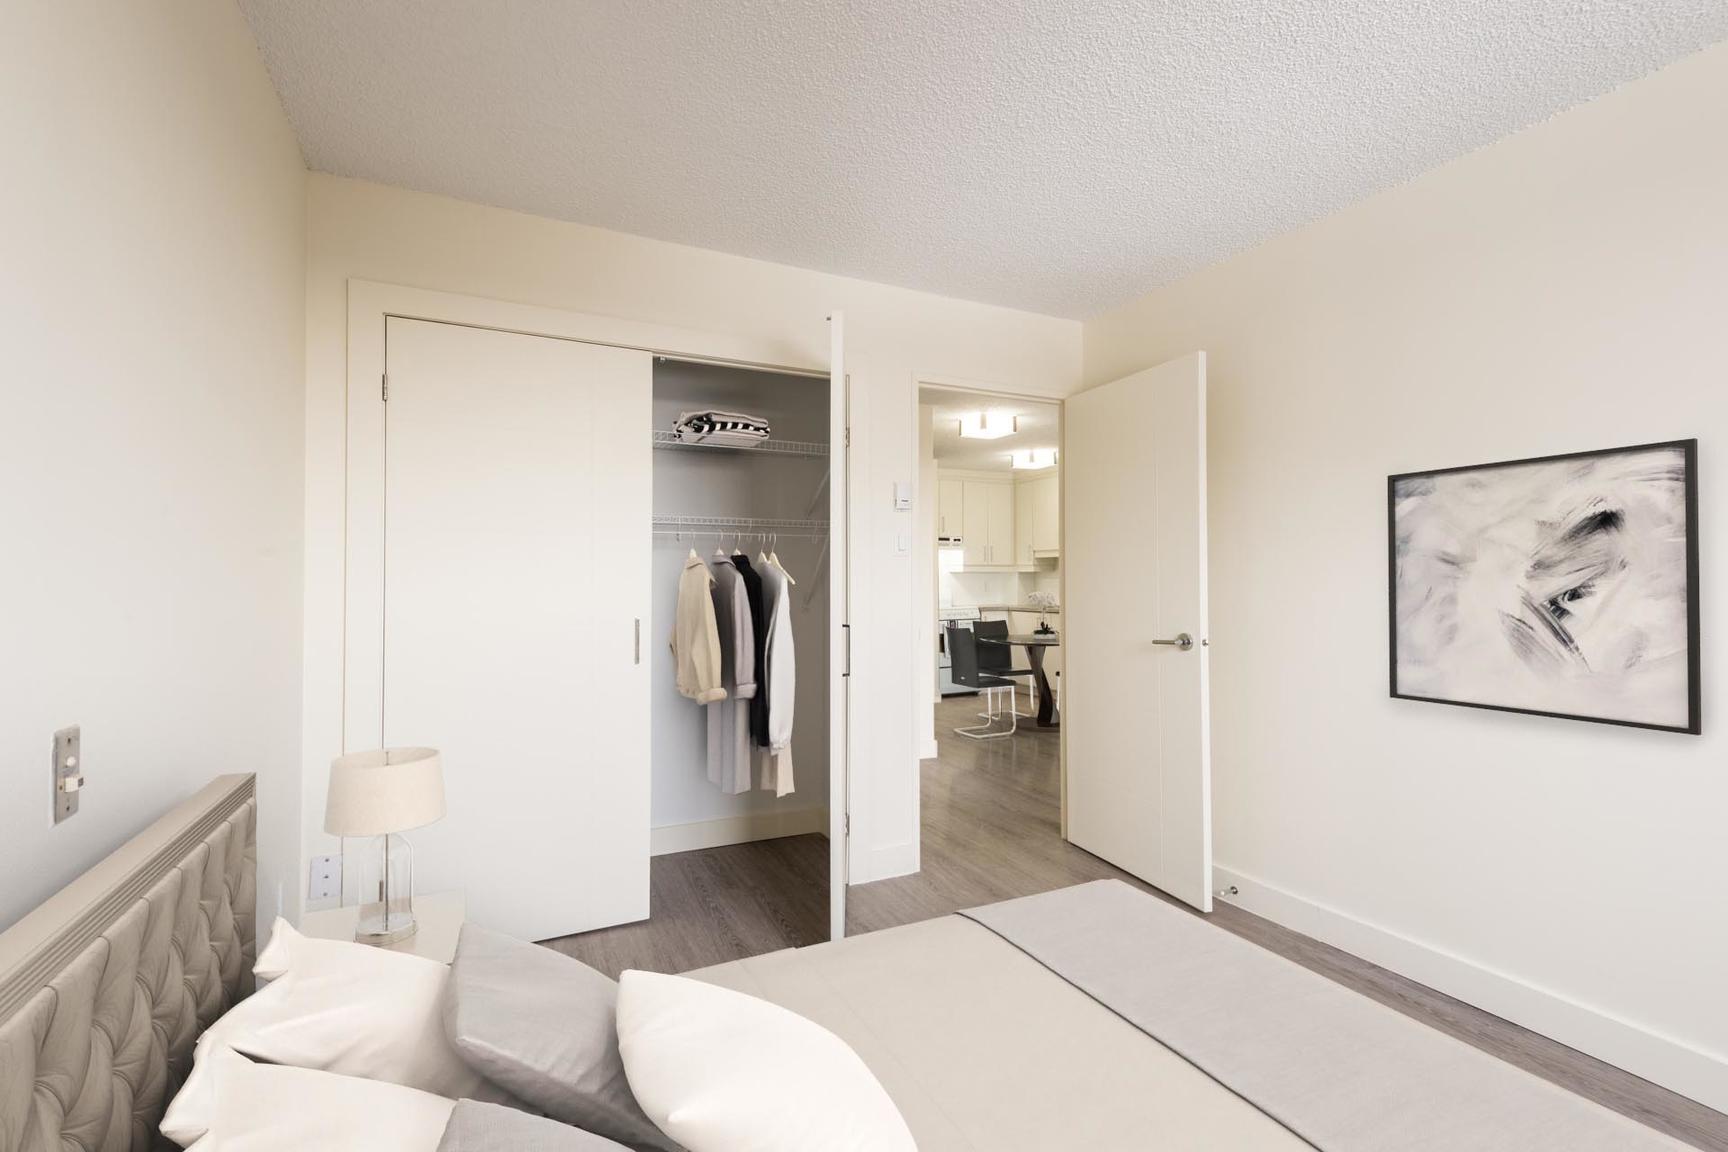 1 bedroom Apartments for rent in Laval at Le Quatre Cent - Photo 13 - RentersPages – L407183